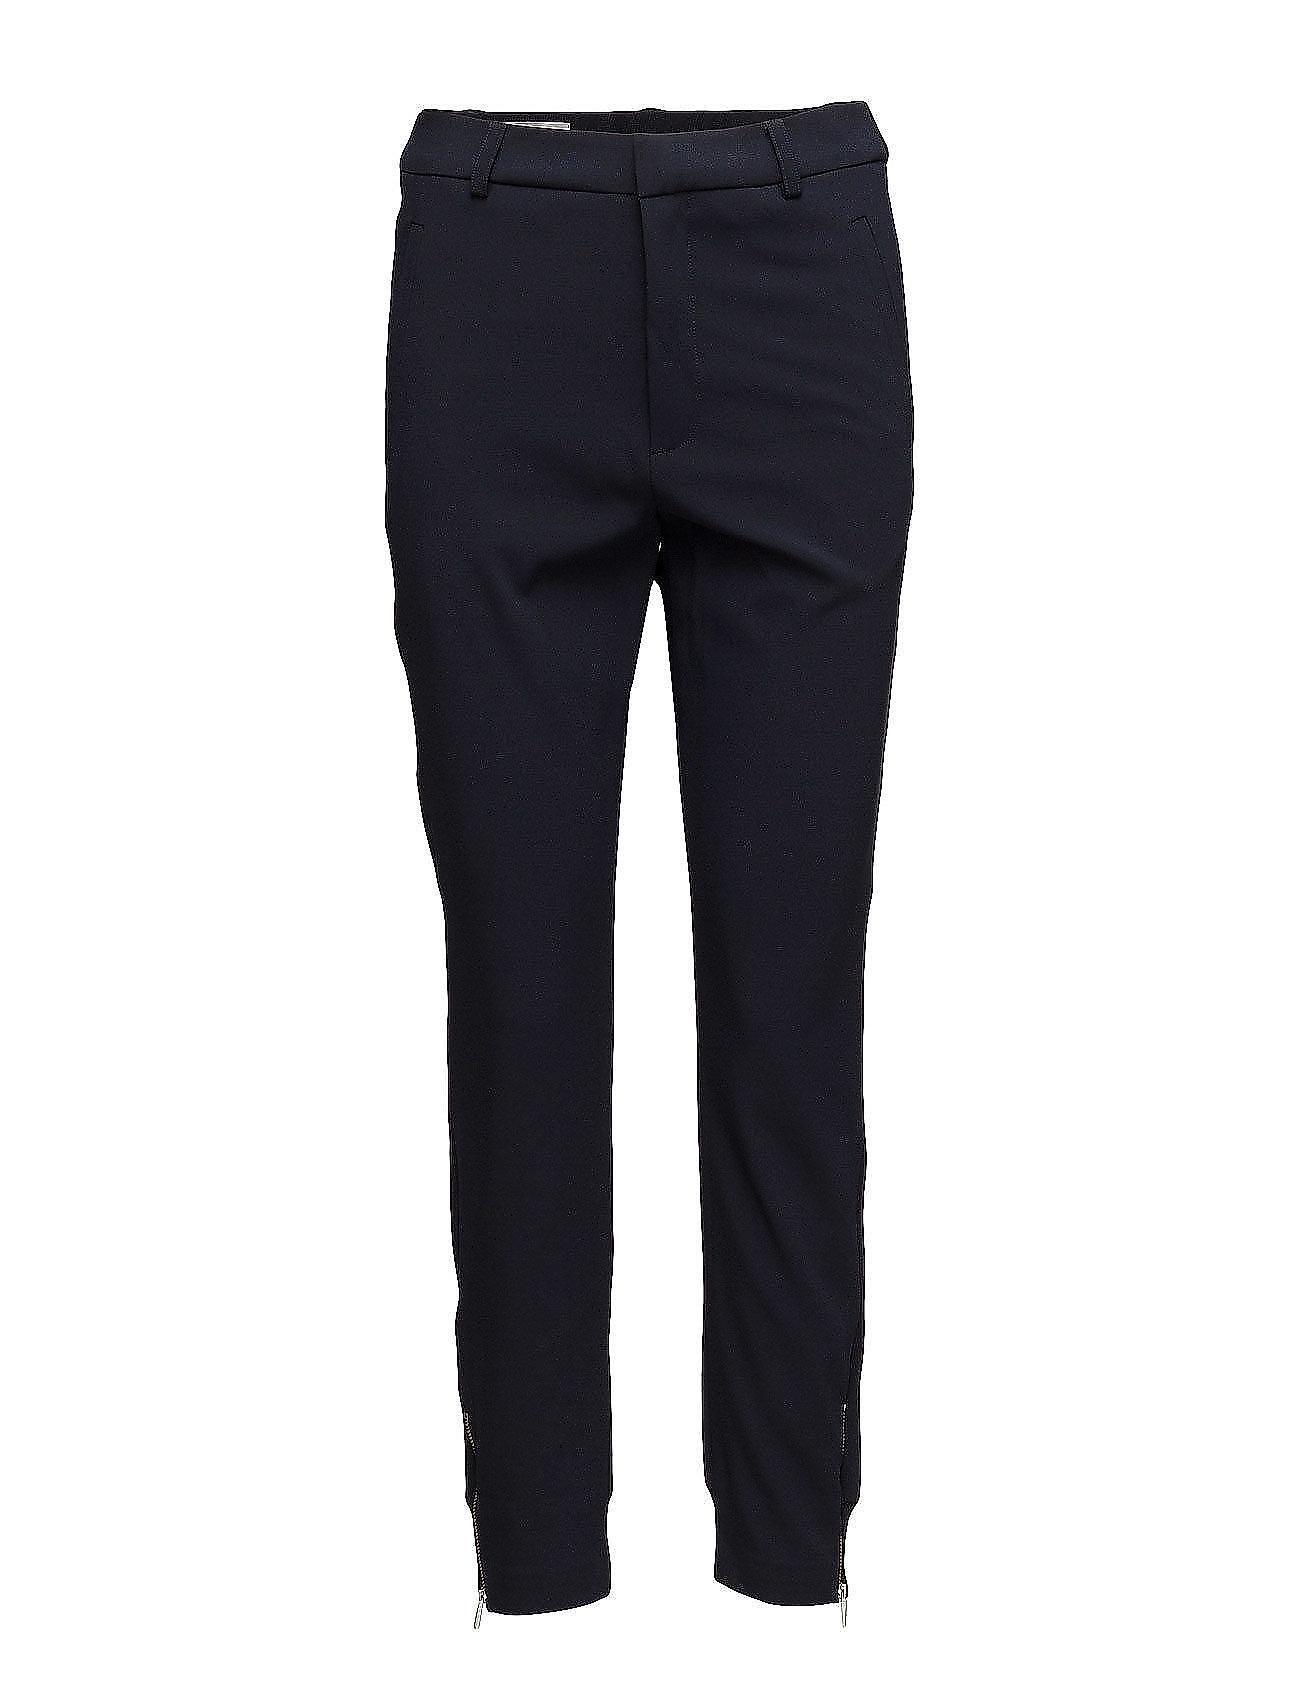 BlueInwear L L Pantsmarine Nica Nica Pantsmarine iuTlOkPZXw